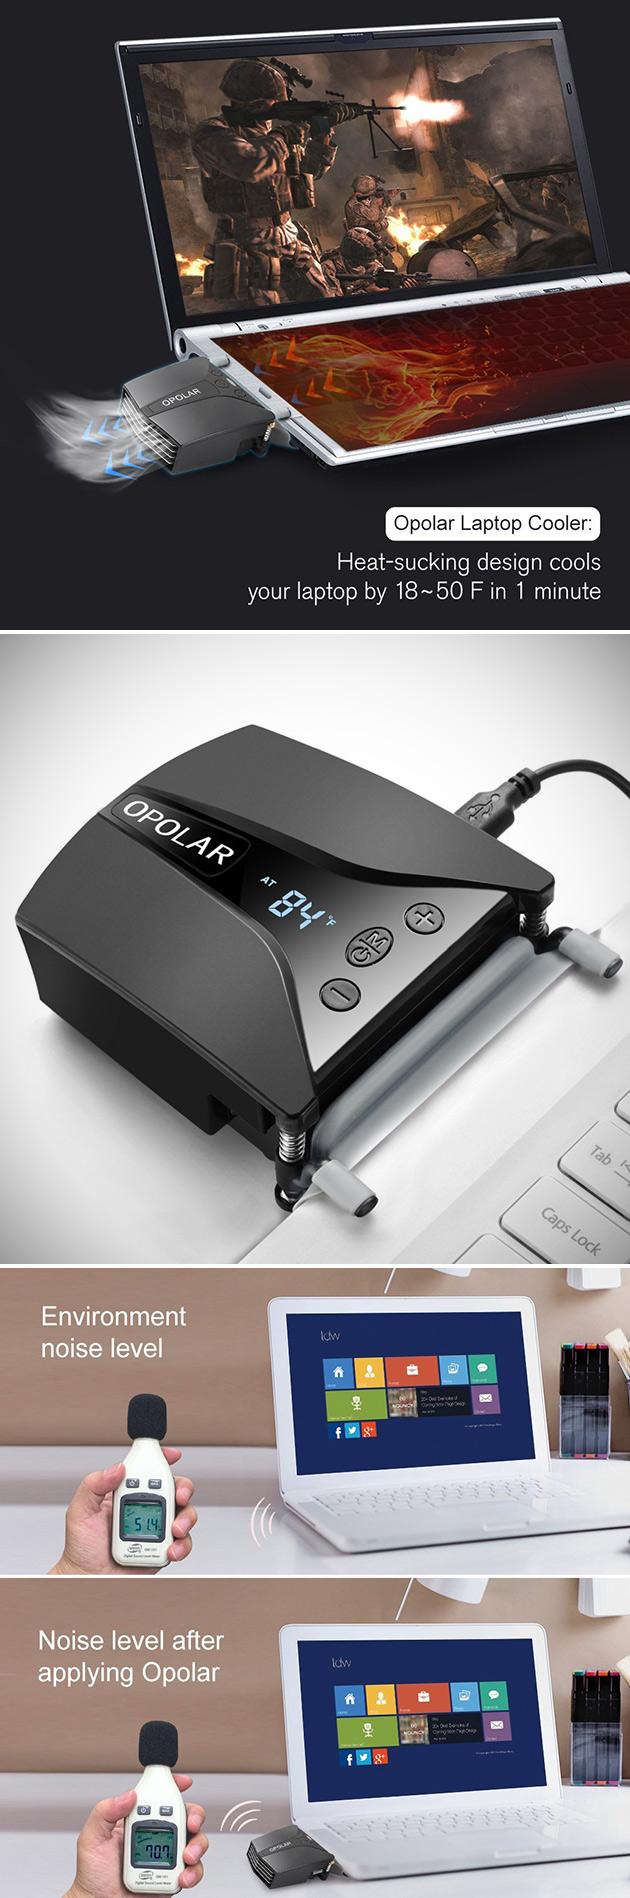 Opolar LC06 Laptop Fan Cooler Has Integrated Temp Display